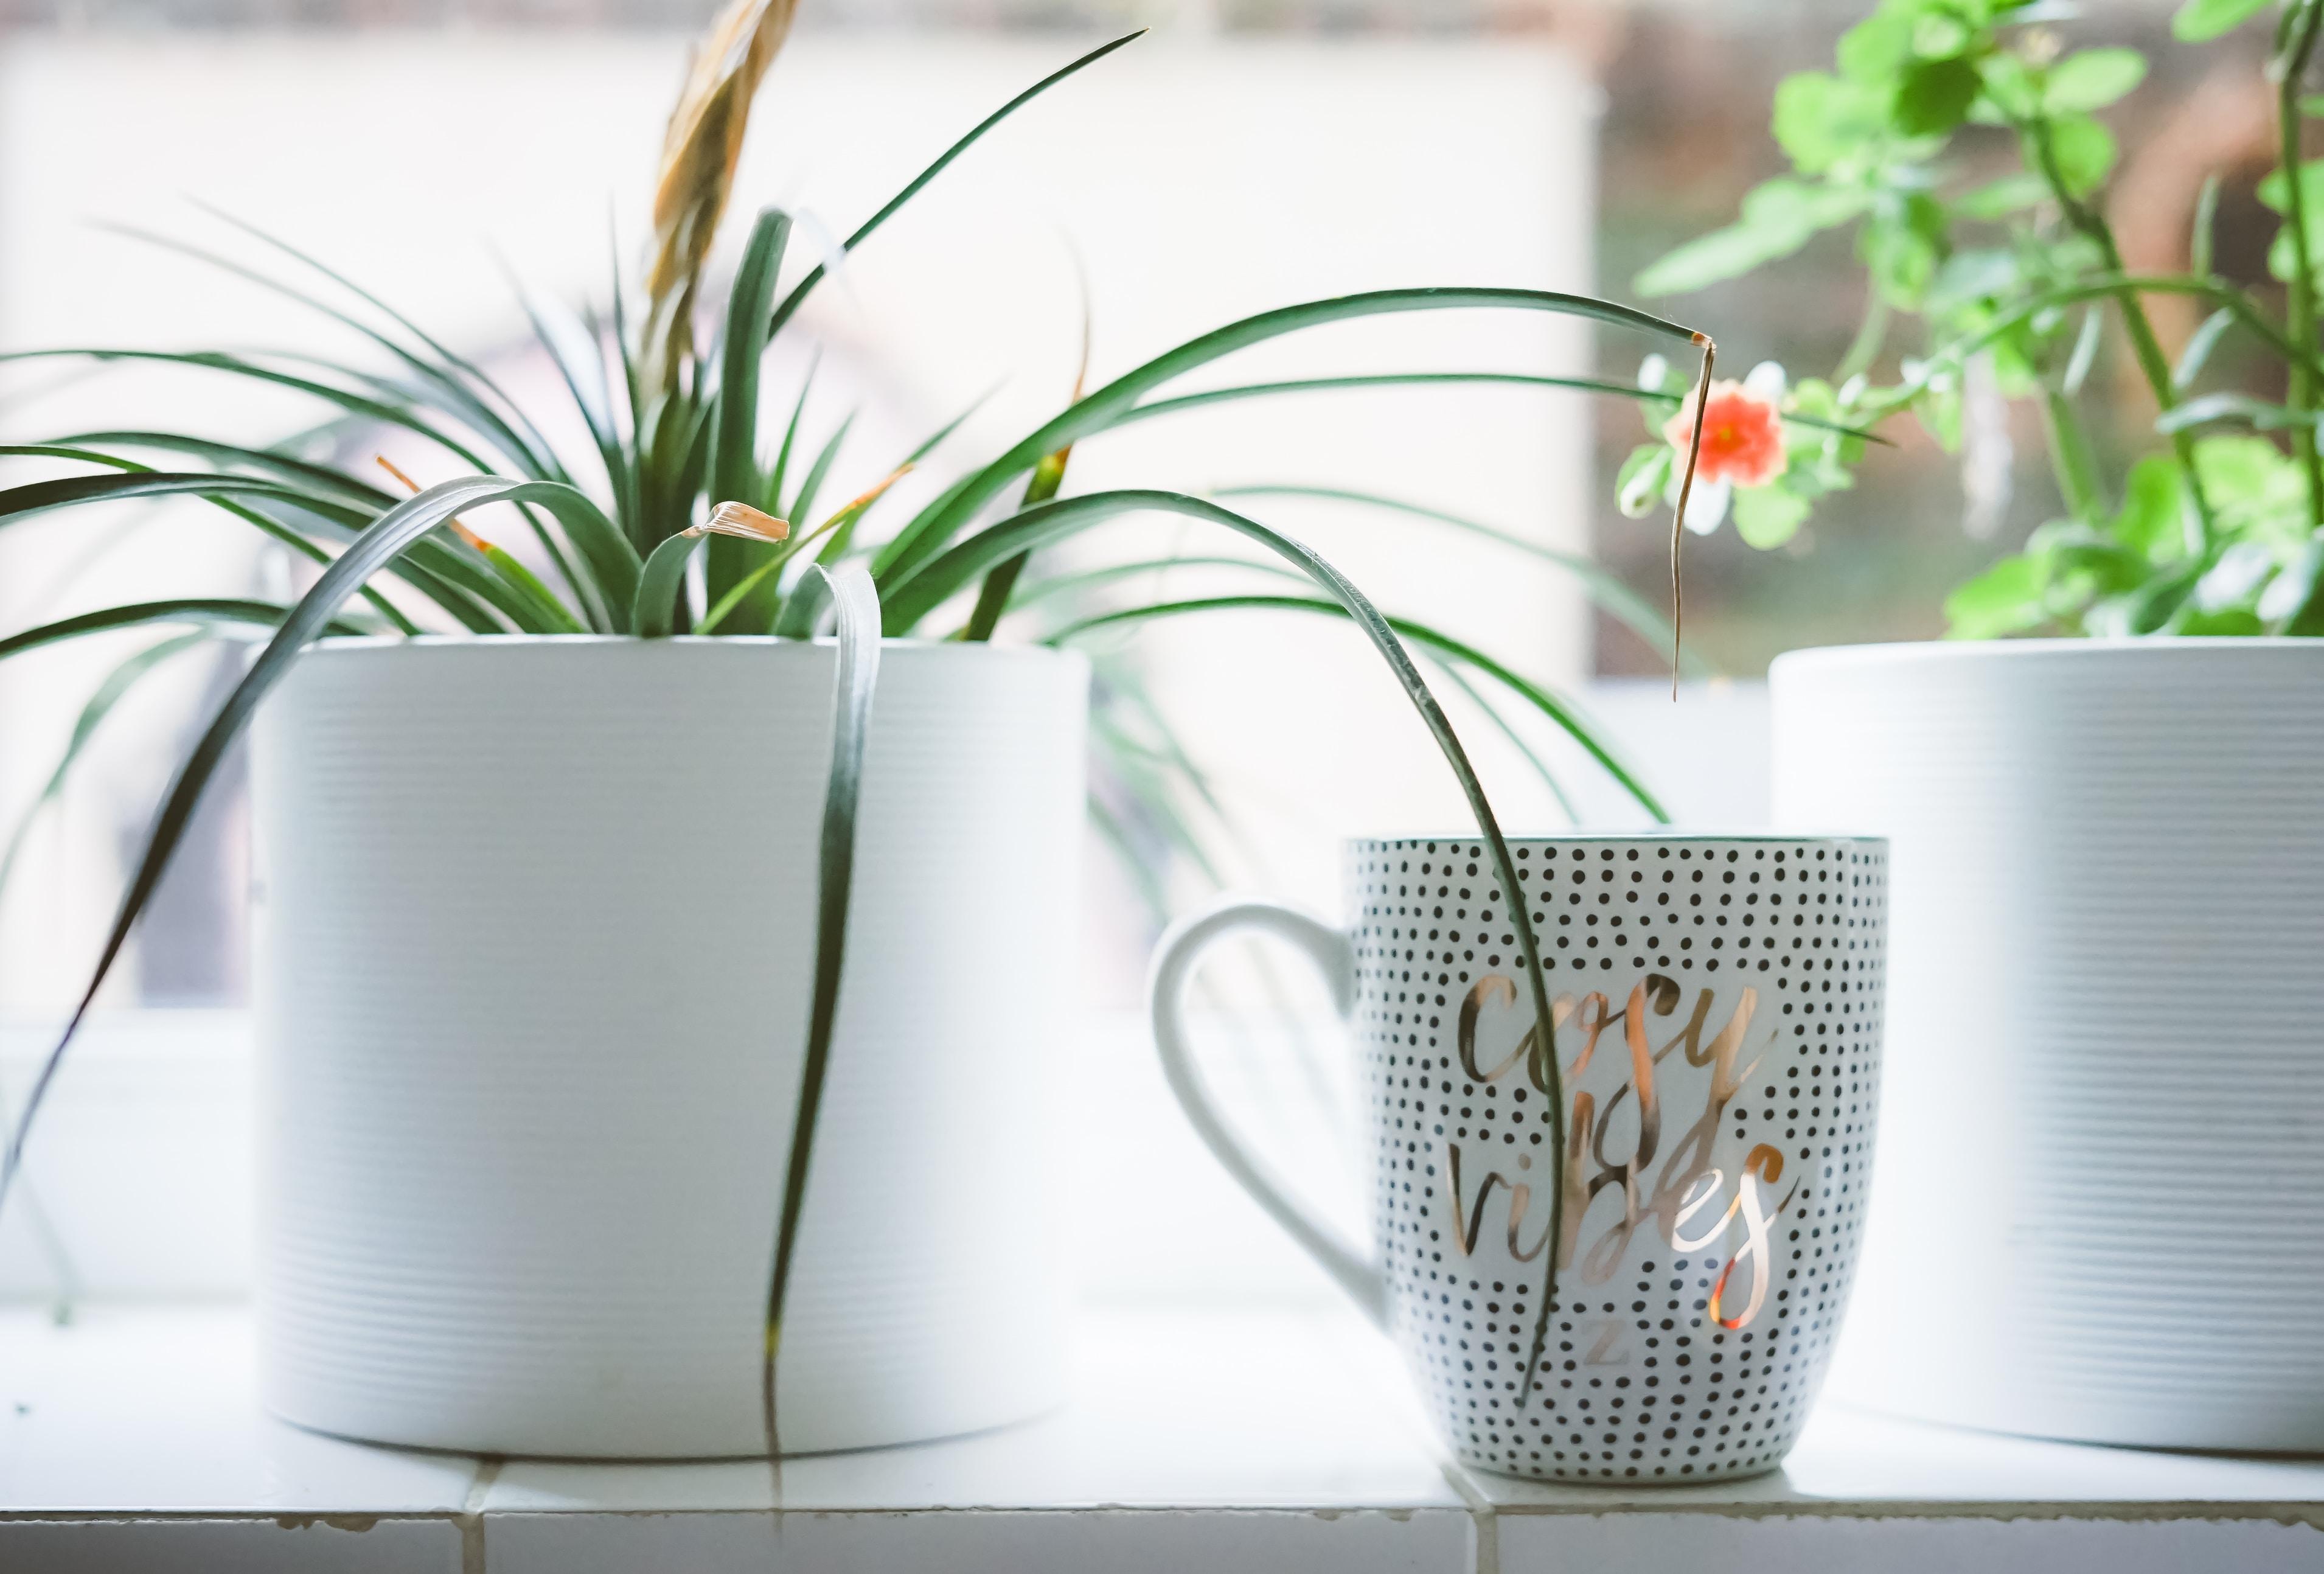 white and silver ceramic mug near flower pot